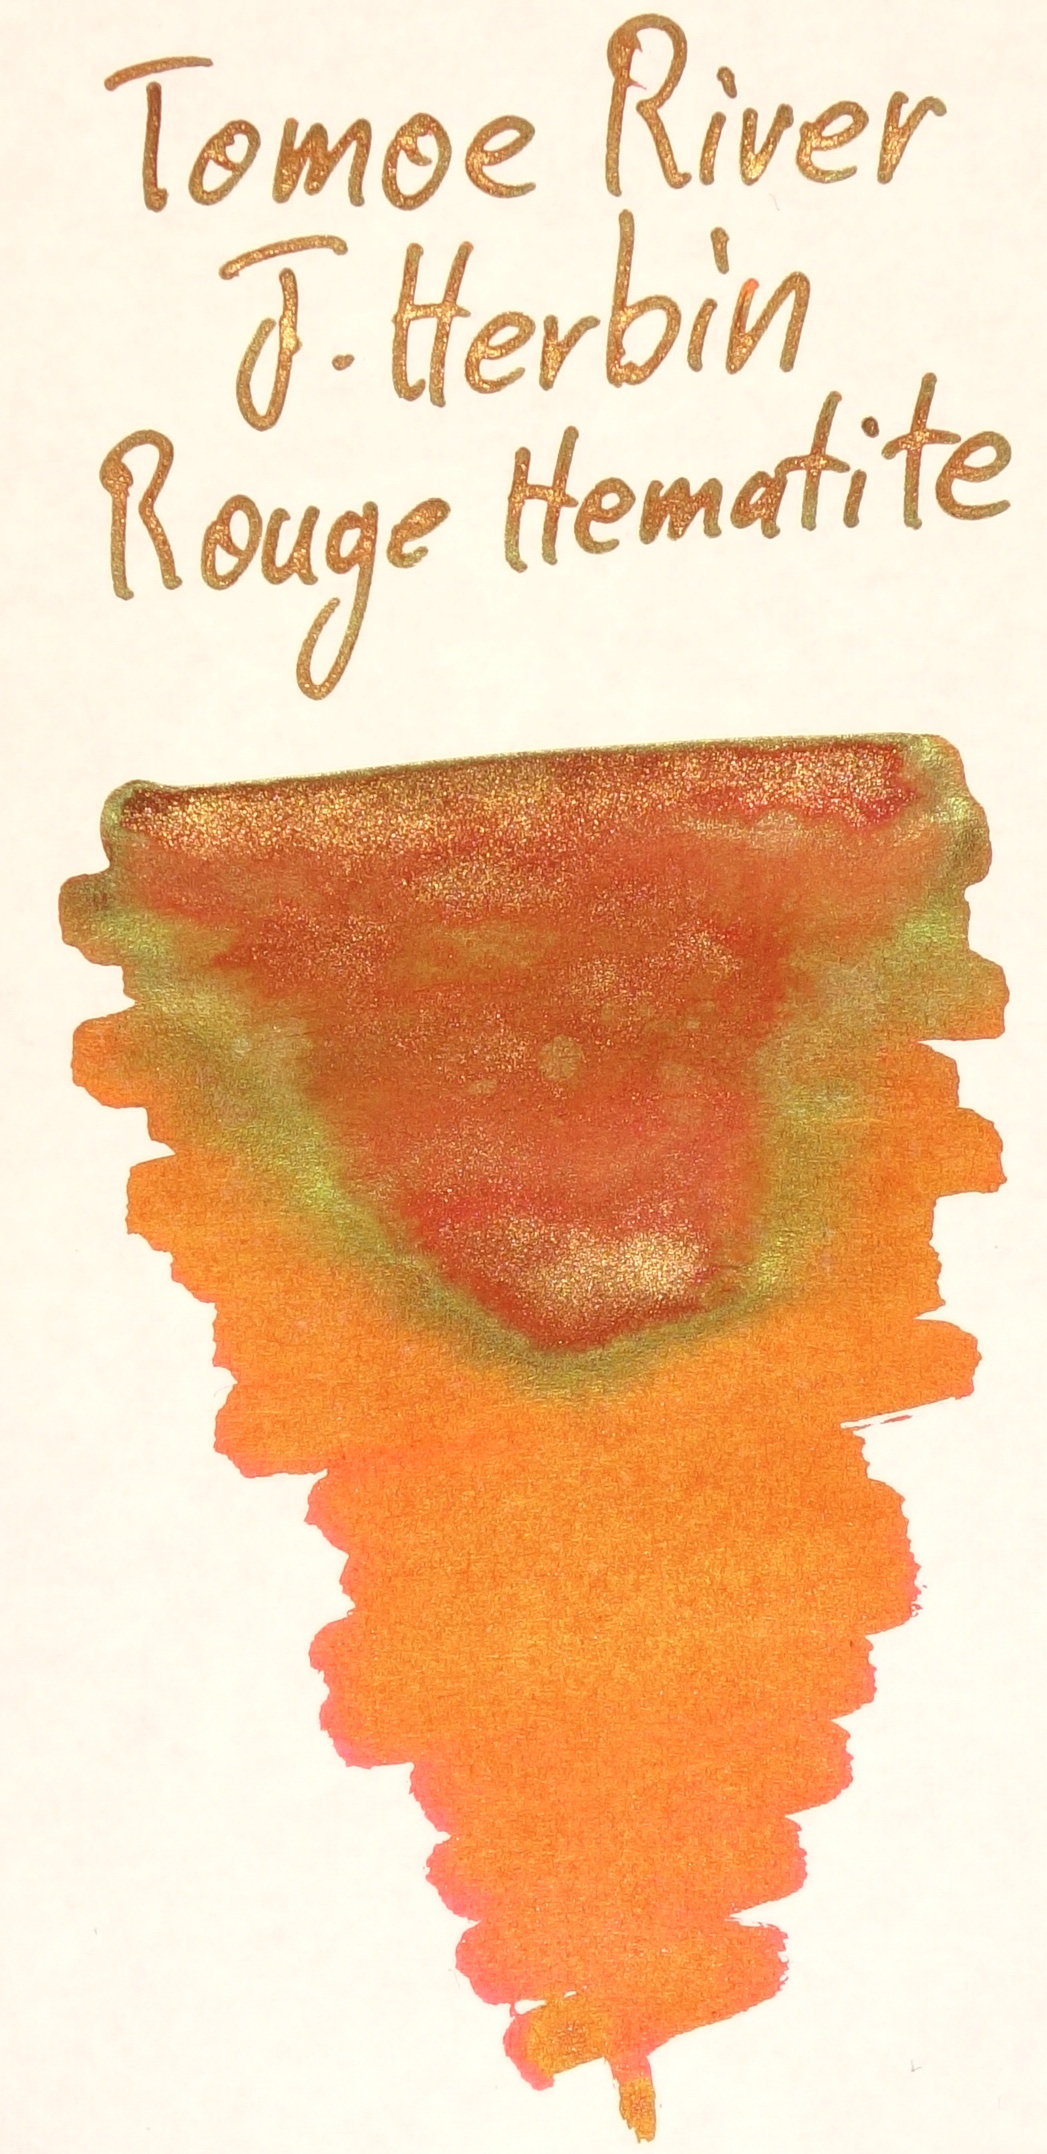 J. Herbin Rouge Hematite Tomoe River.JPG